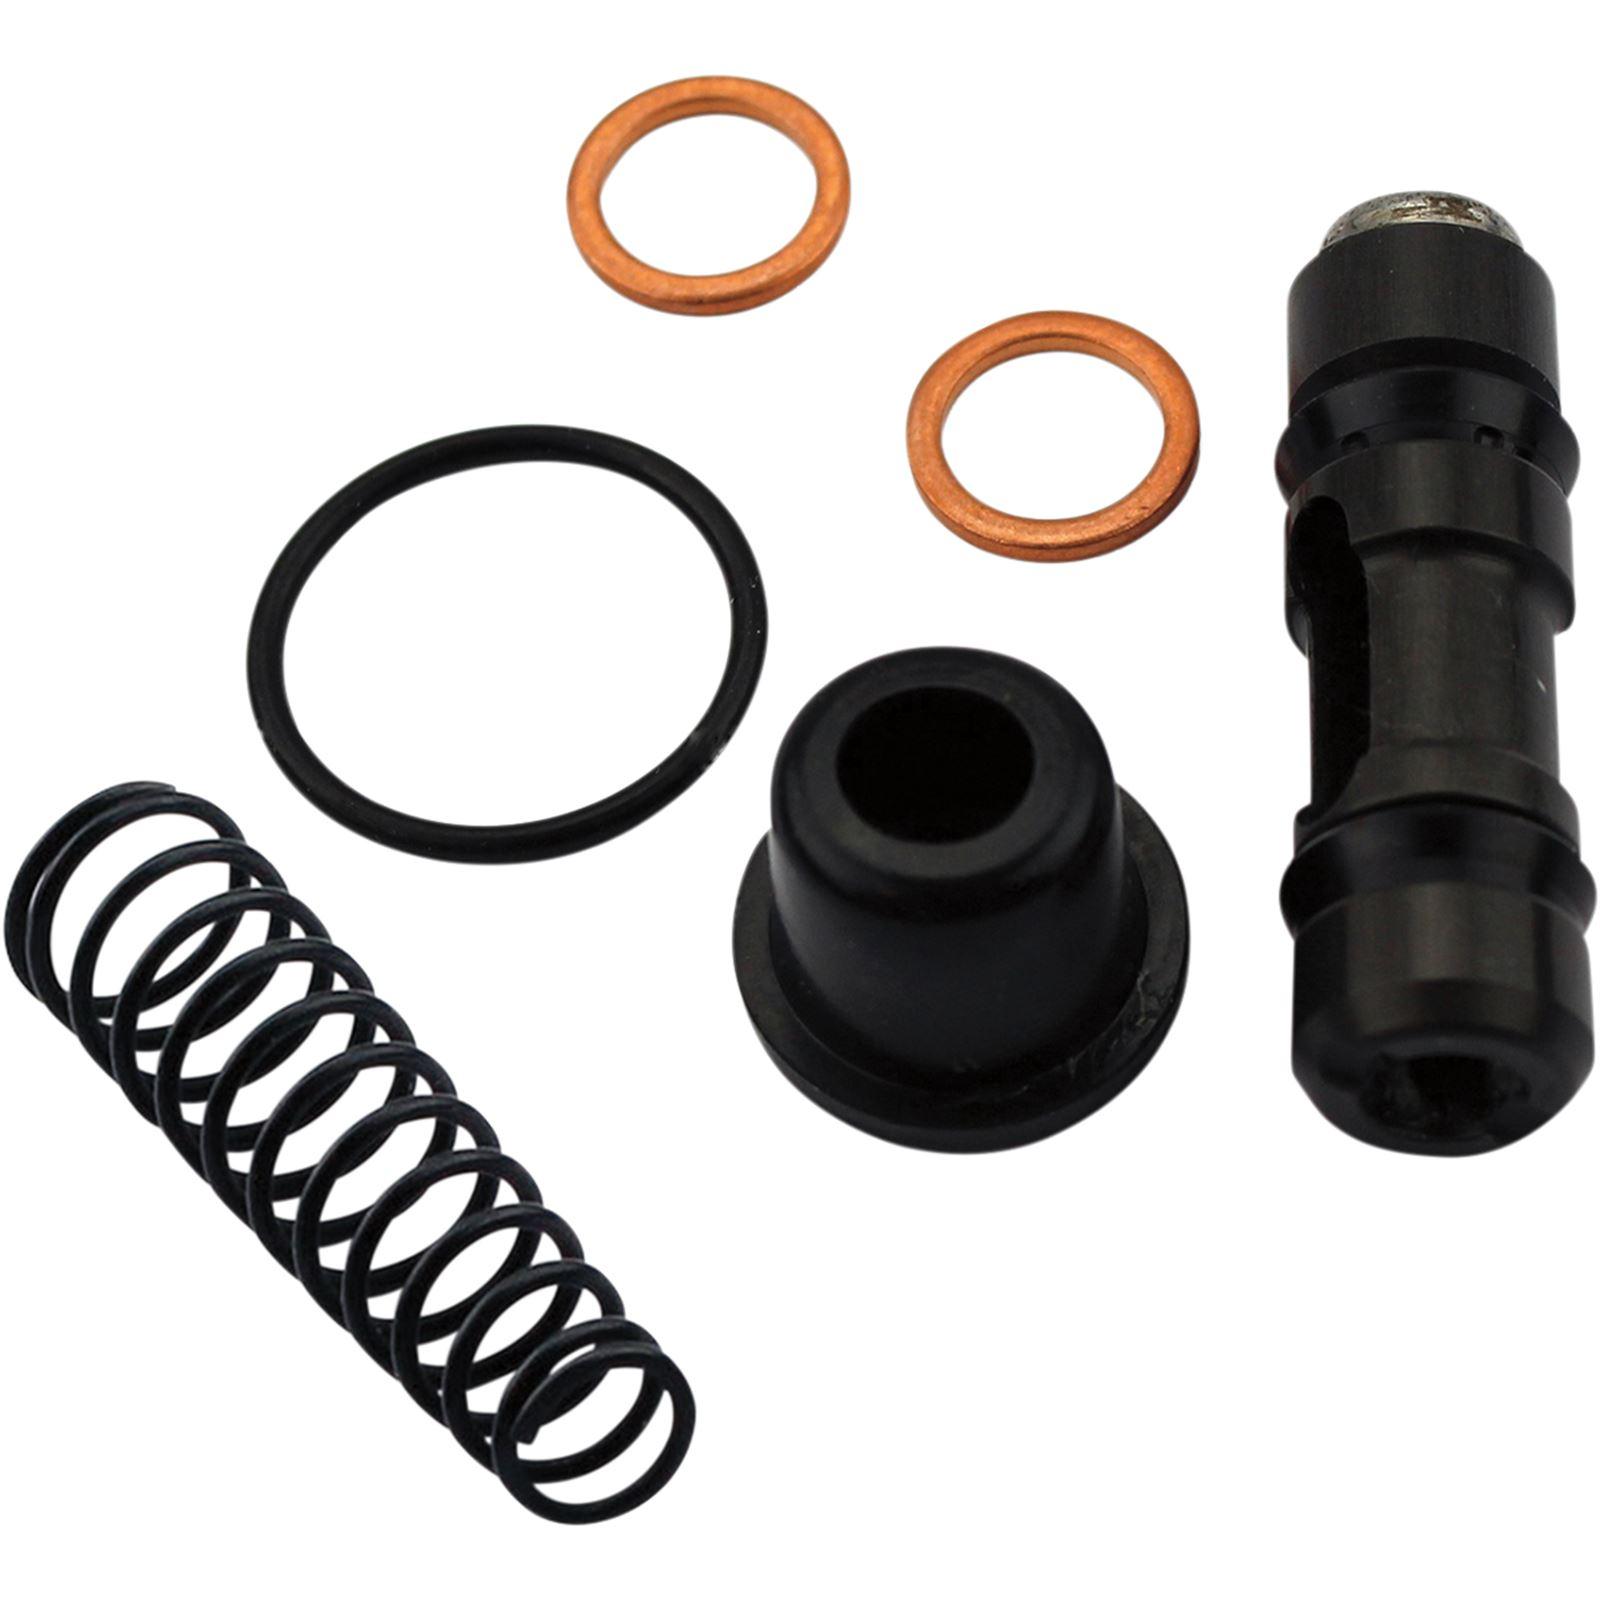 Moose Racing Master Cylinder Repair Kit for KTM